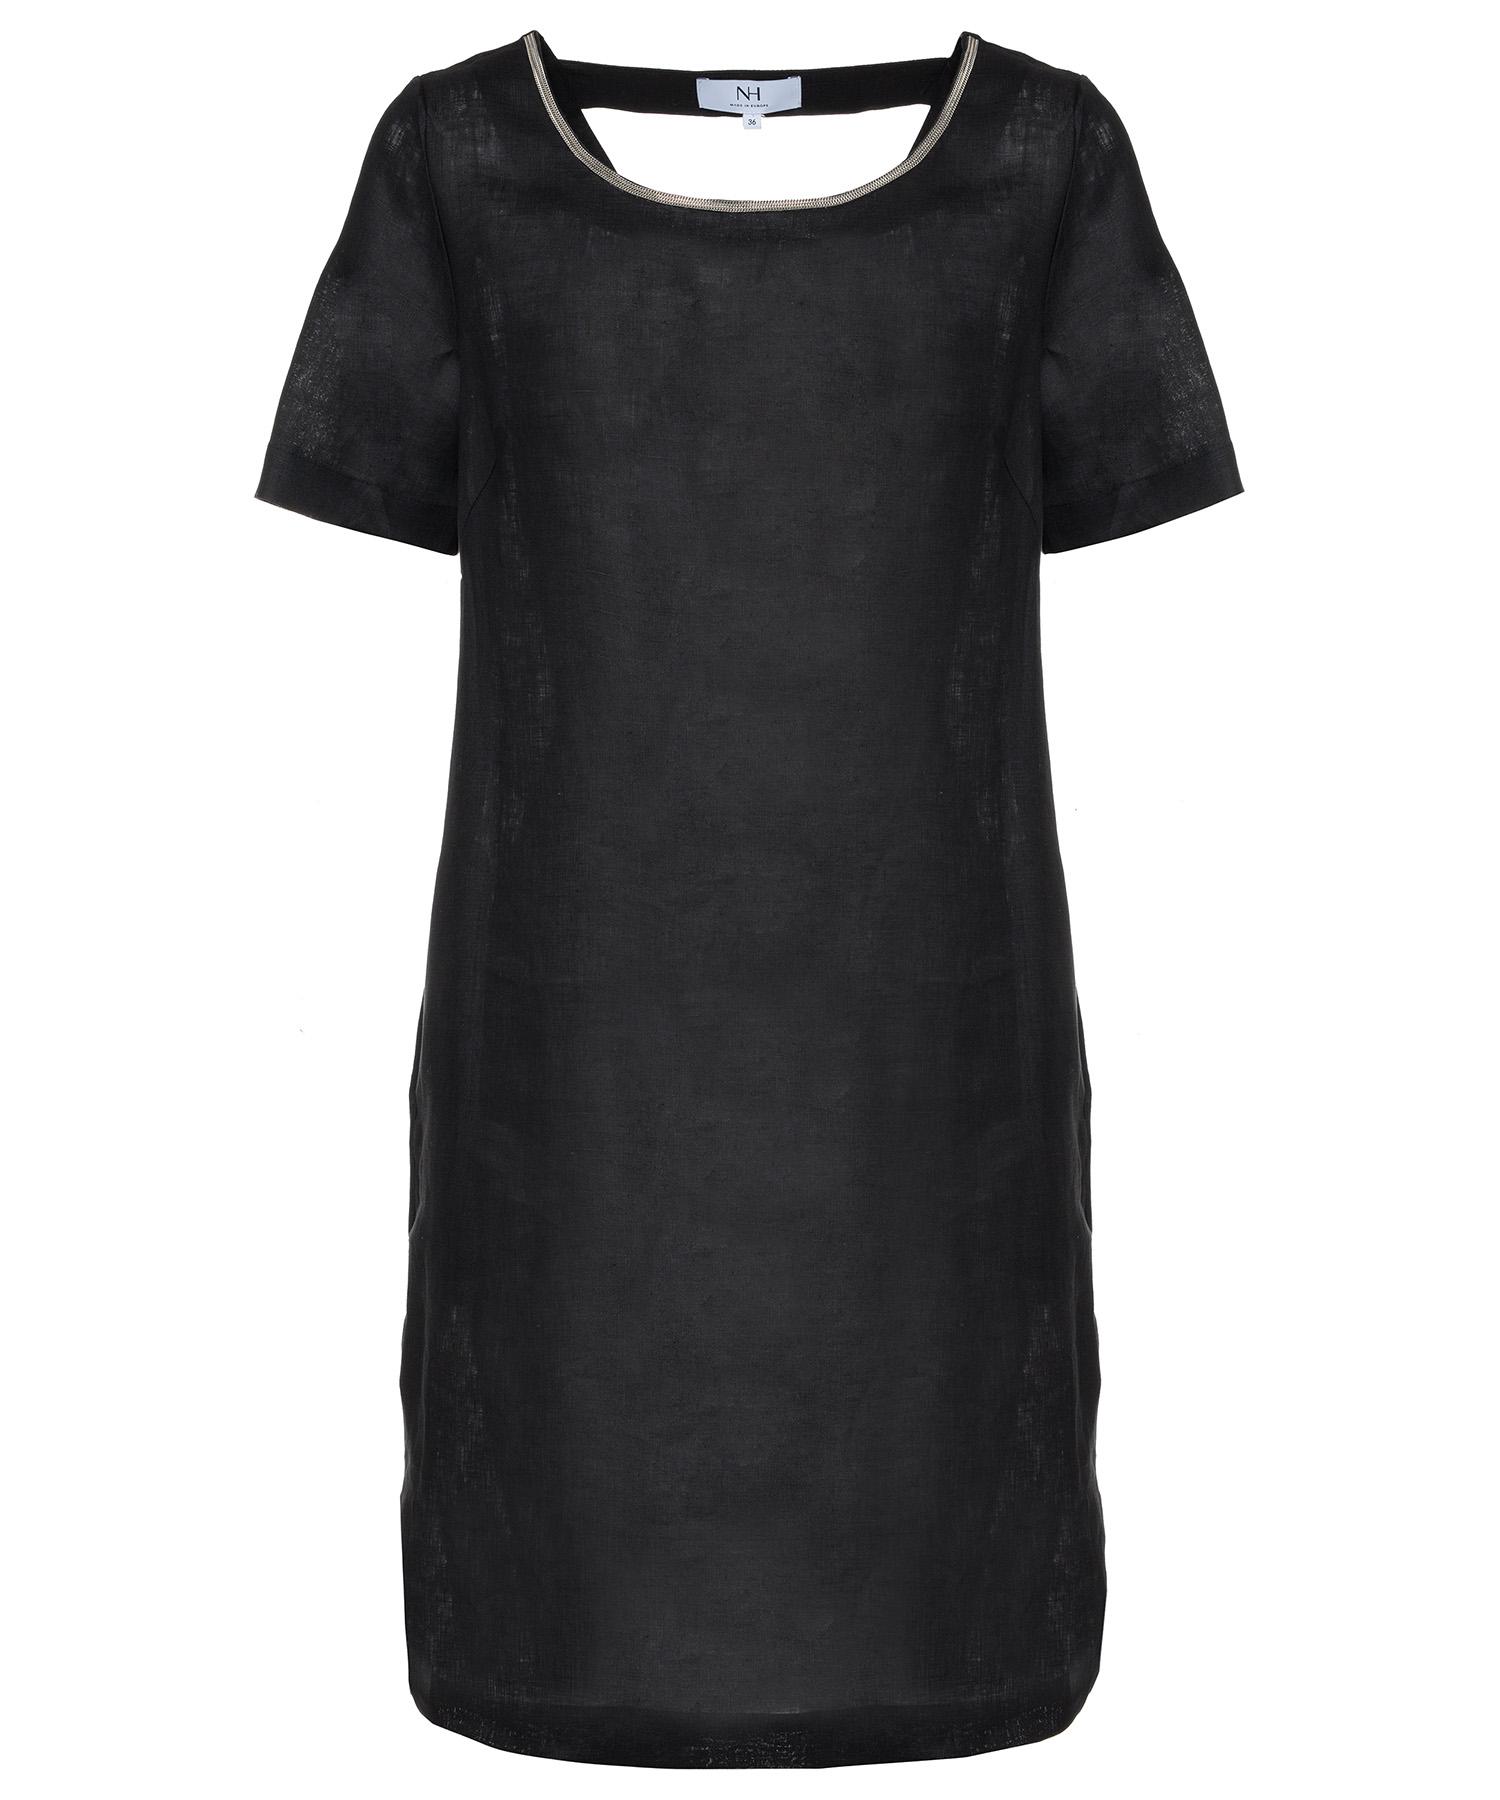 b41daf265fefb6 Nadine H. linnen jurk